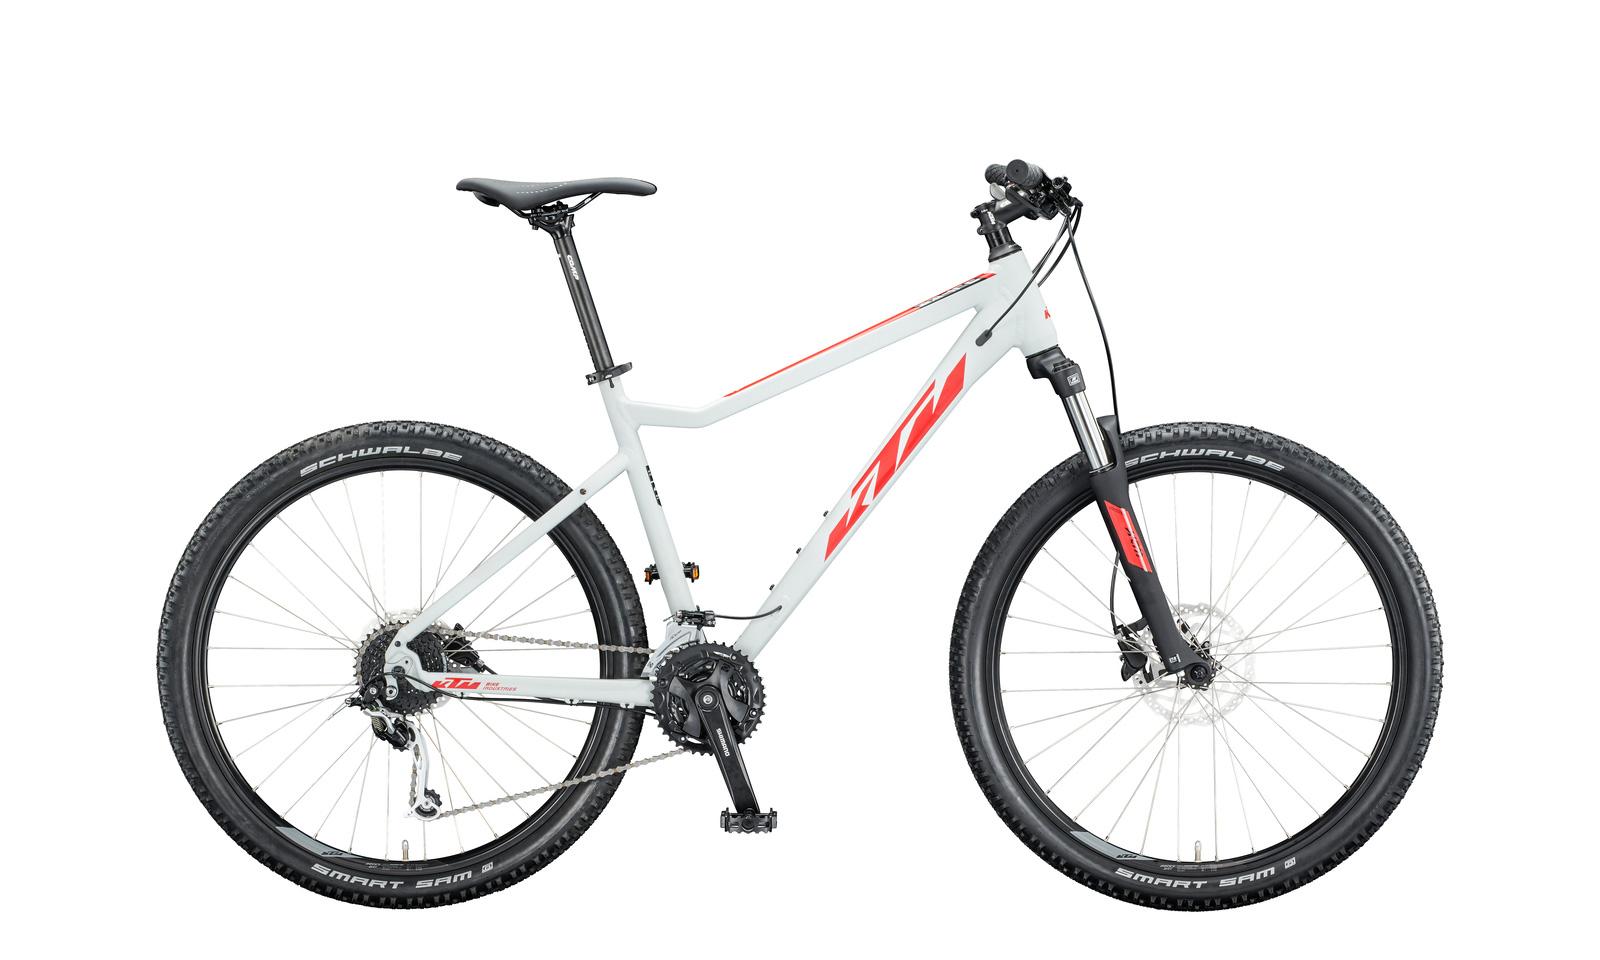 Biciclete KTM MTB Hardtail ULTRA FUN 27.27 3x9 Shimano Deore XT